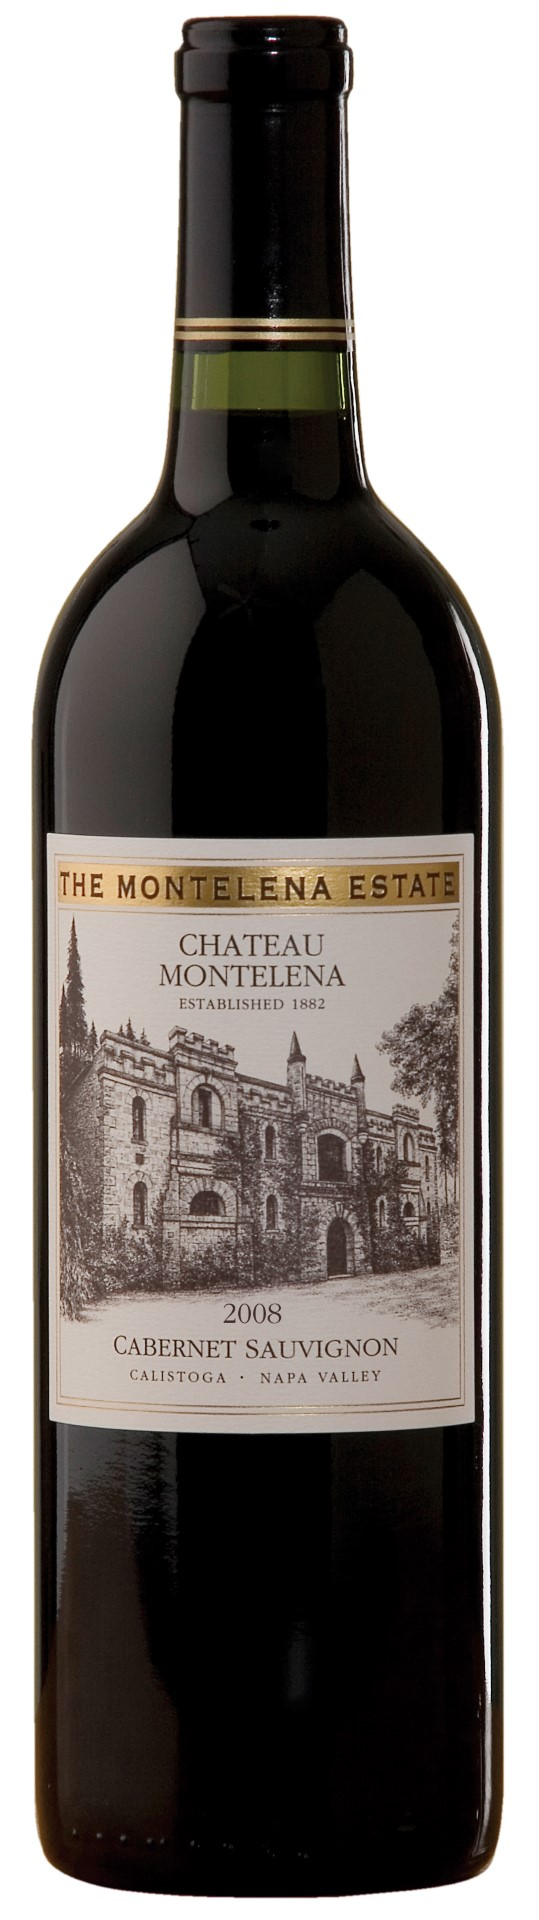 2013 Chateau Montelena Cabernet Sauvignon Calistoga